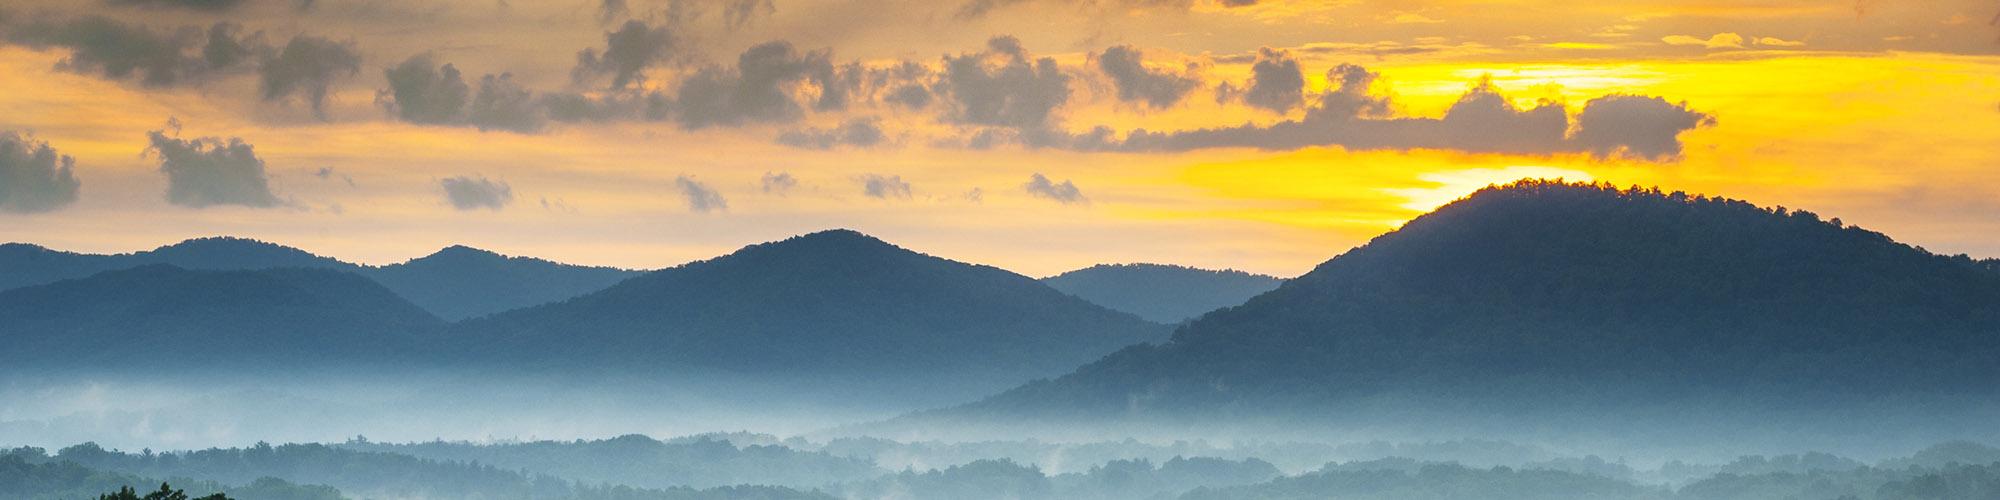 Asheville NC Blue Ridge Mountains Sunset and Fog Landscape Photography near the Blue Ridge Parkway in Western North Carolina